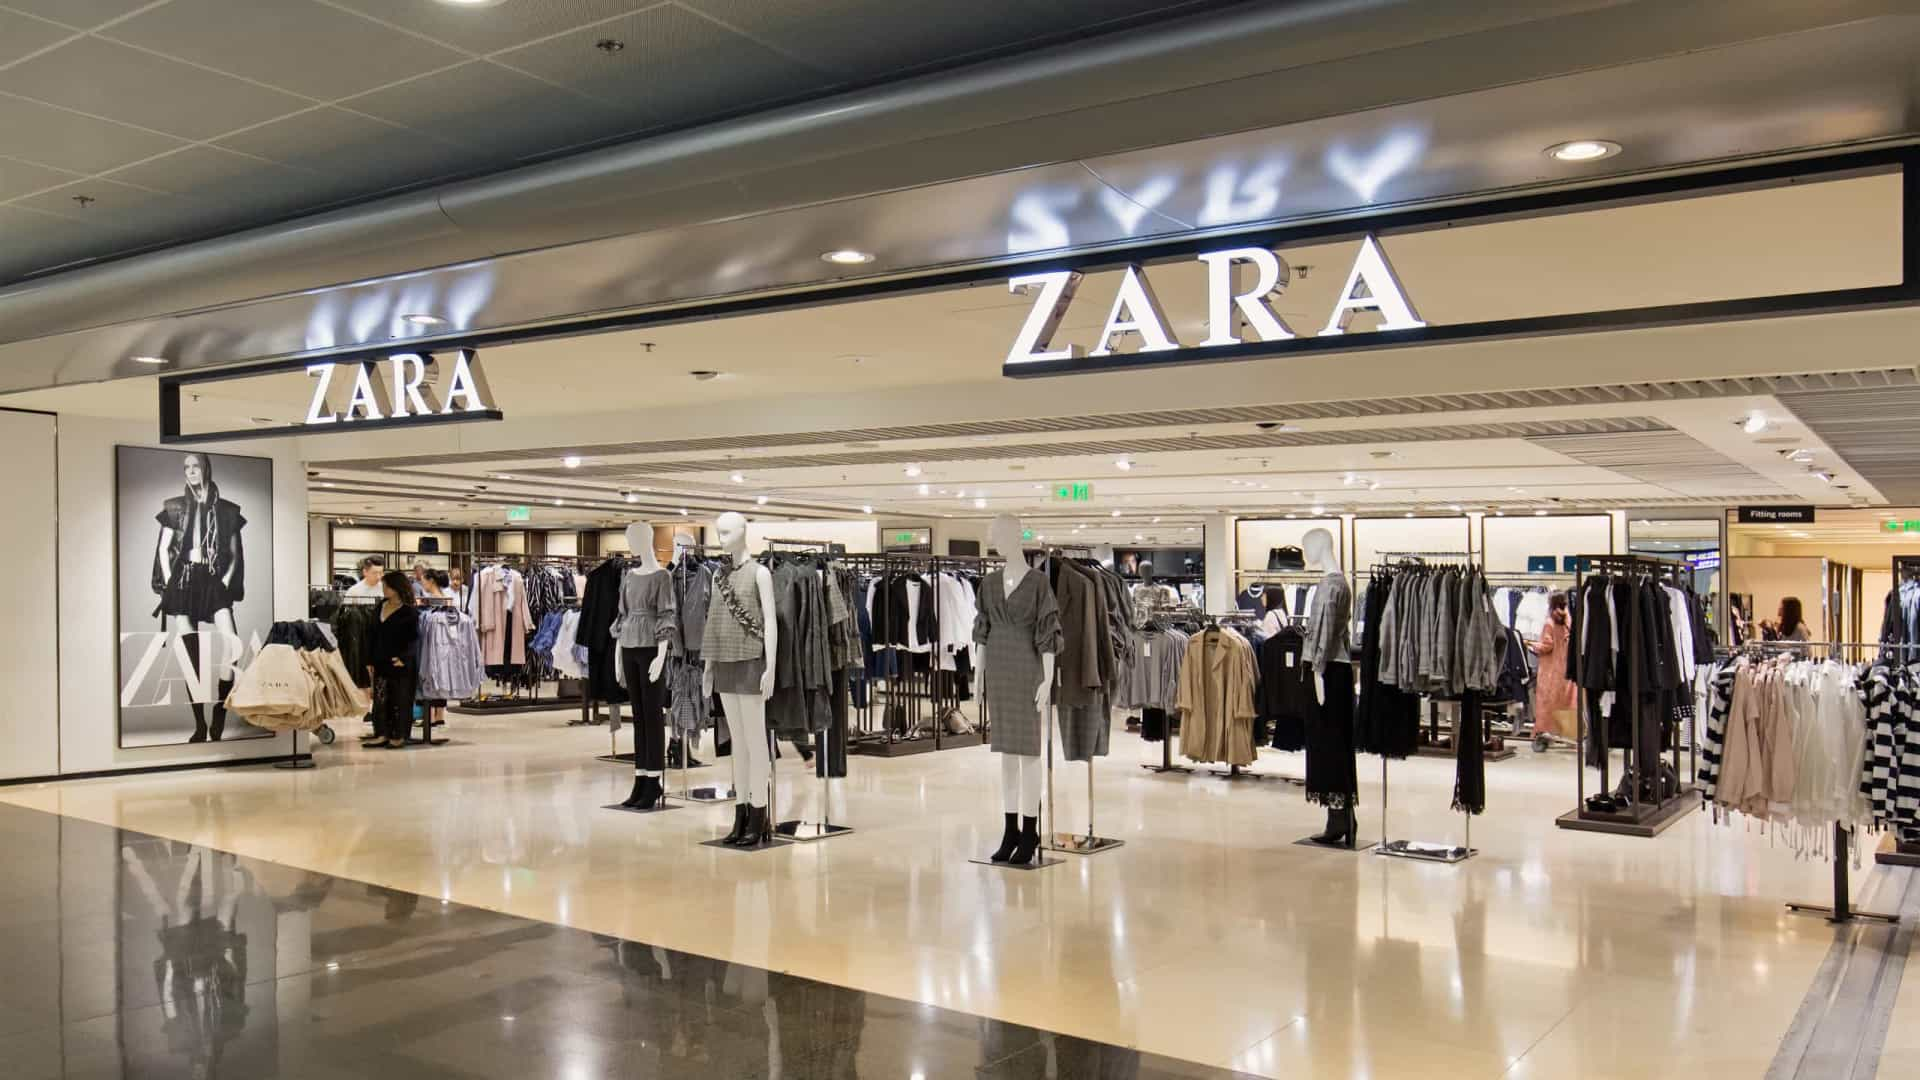 Varejista Zara fecha sete lojas no Brasil